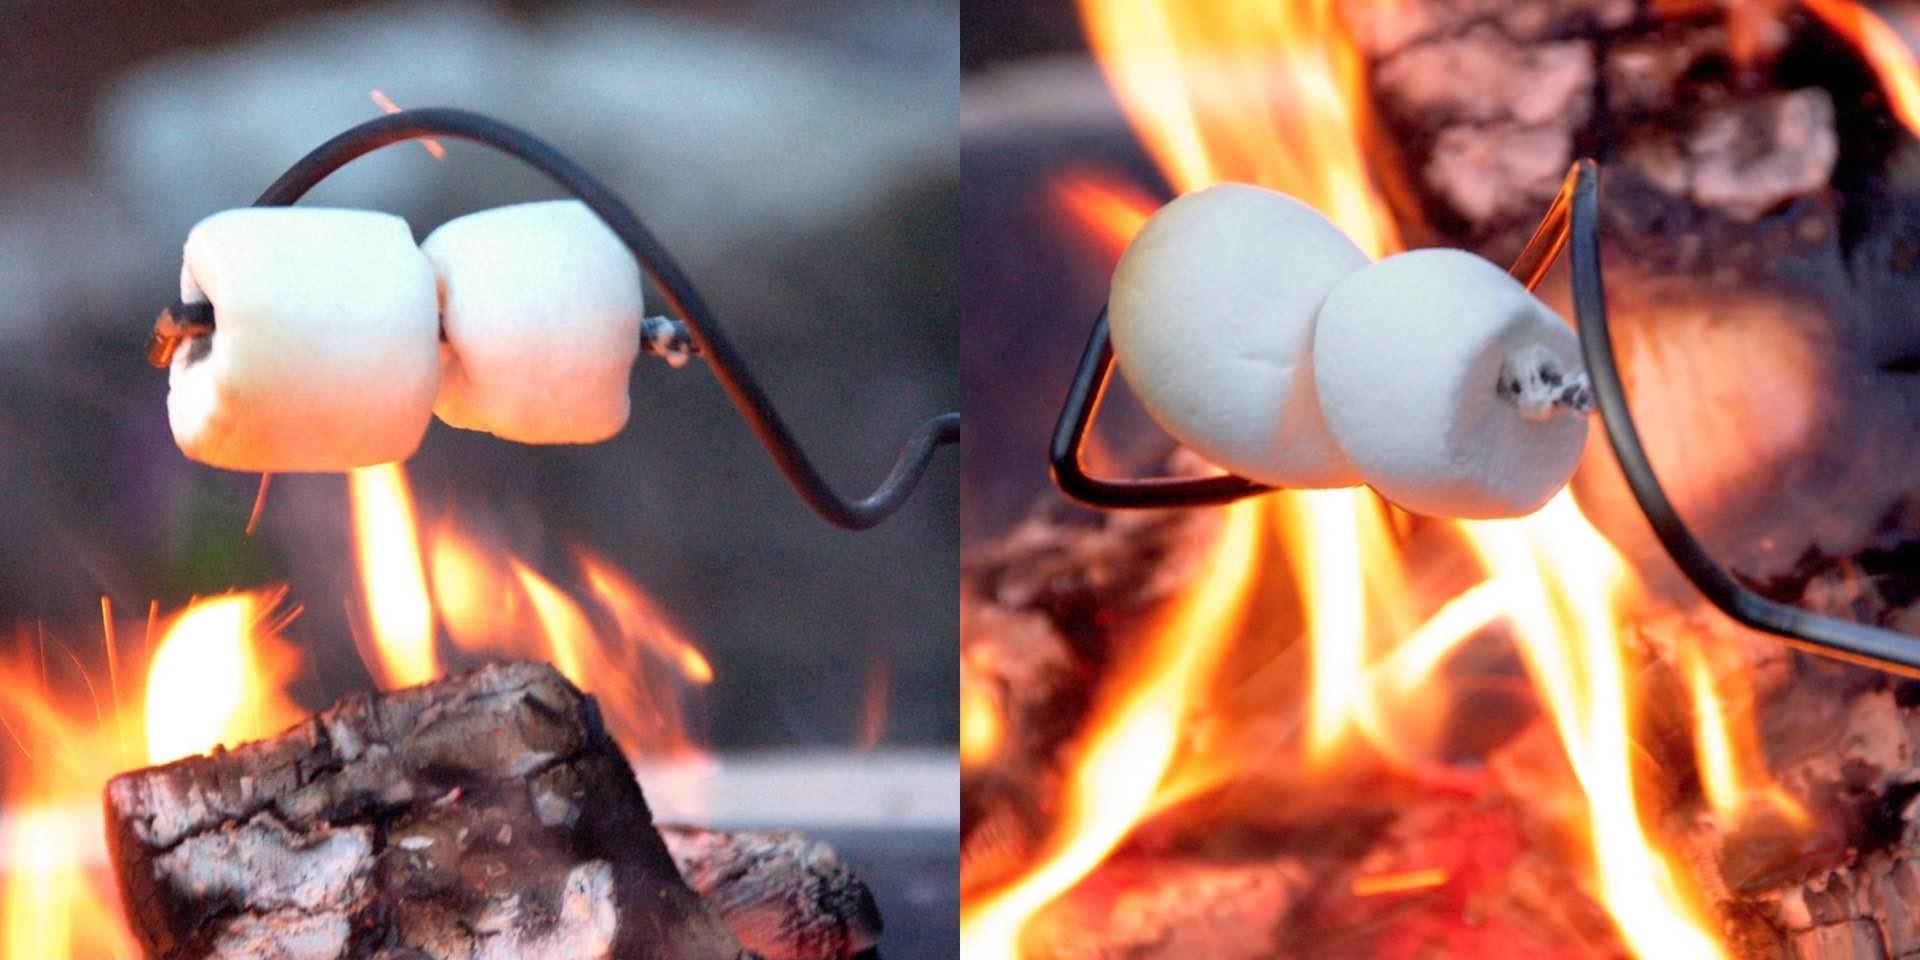 curly-dog-roasters-curly-marshmallow-roasting-sticks